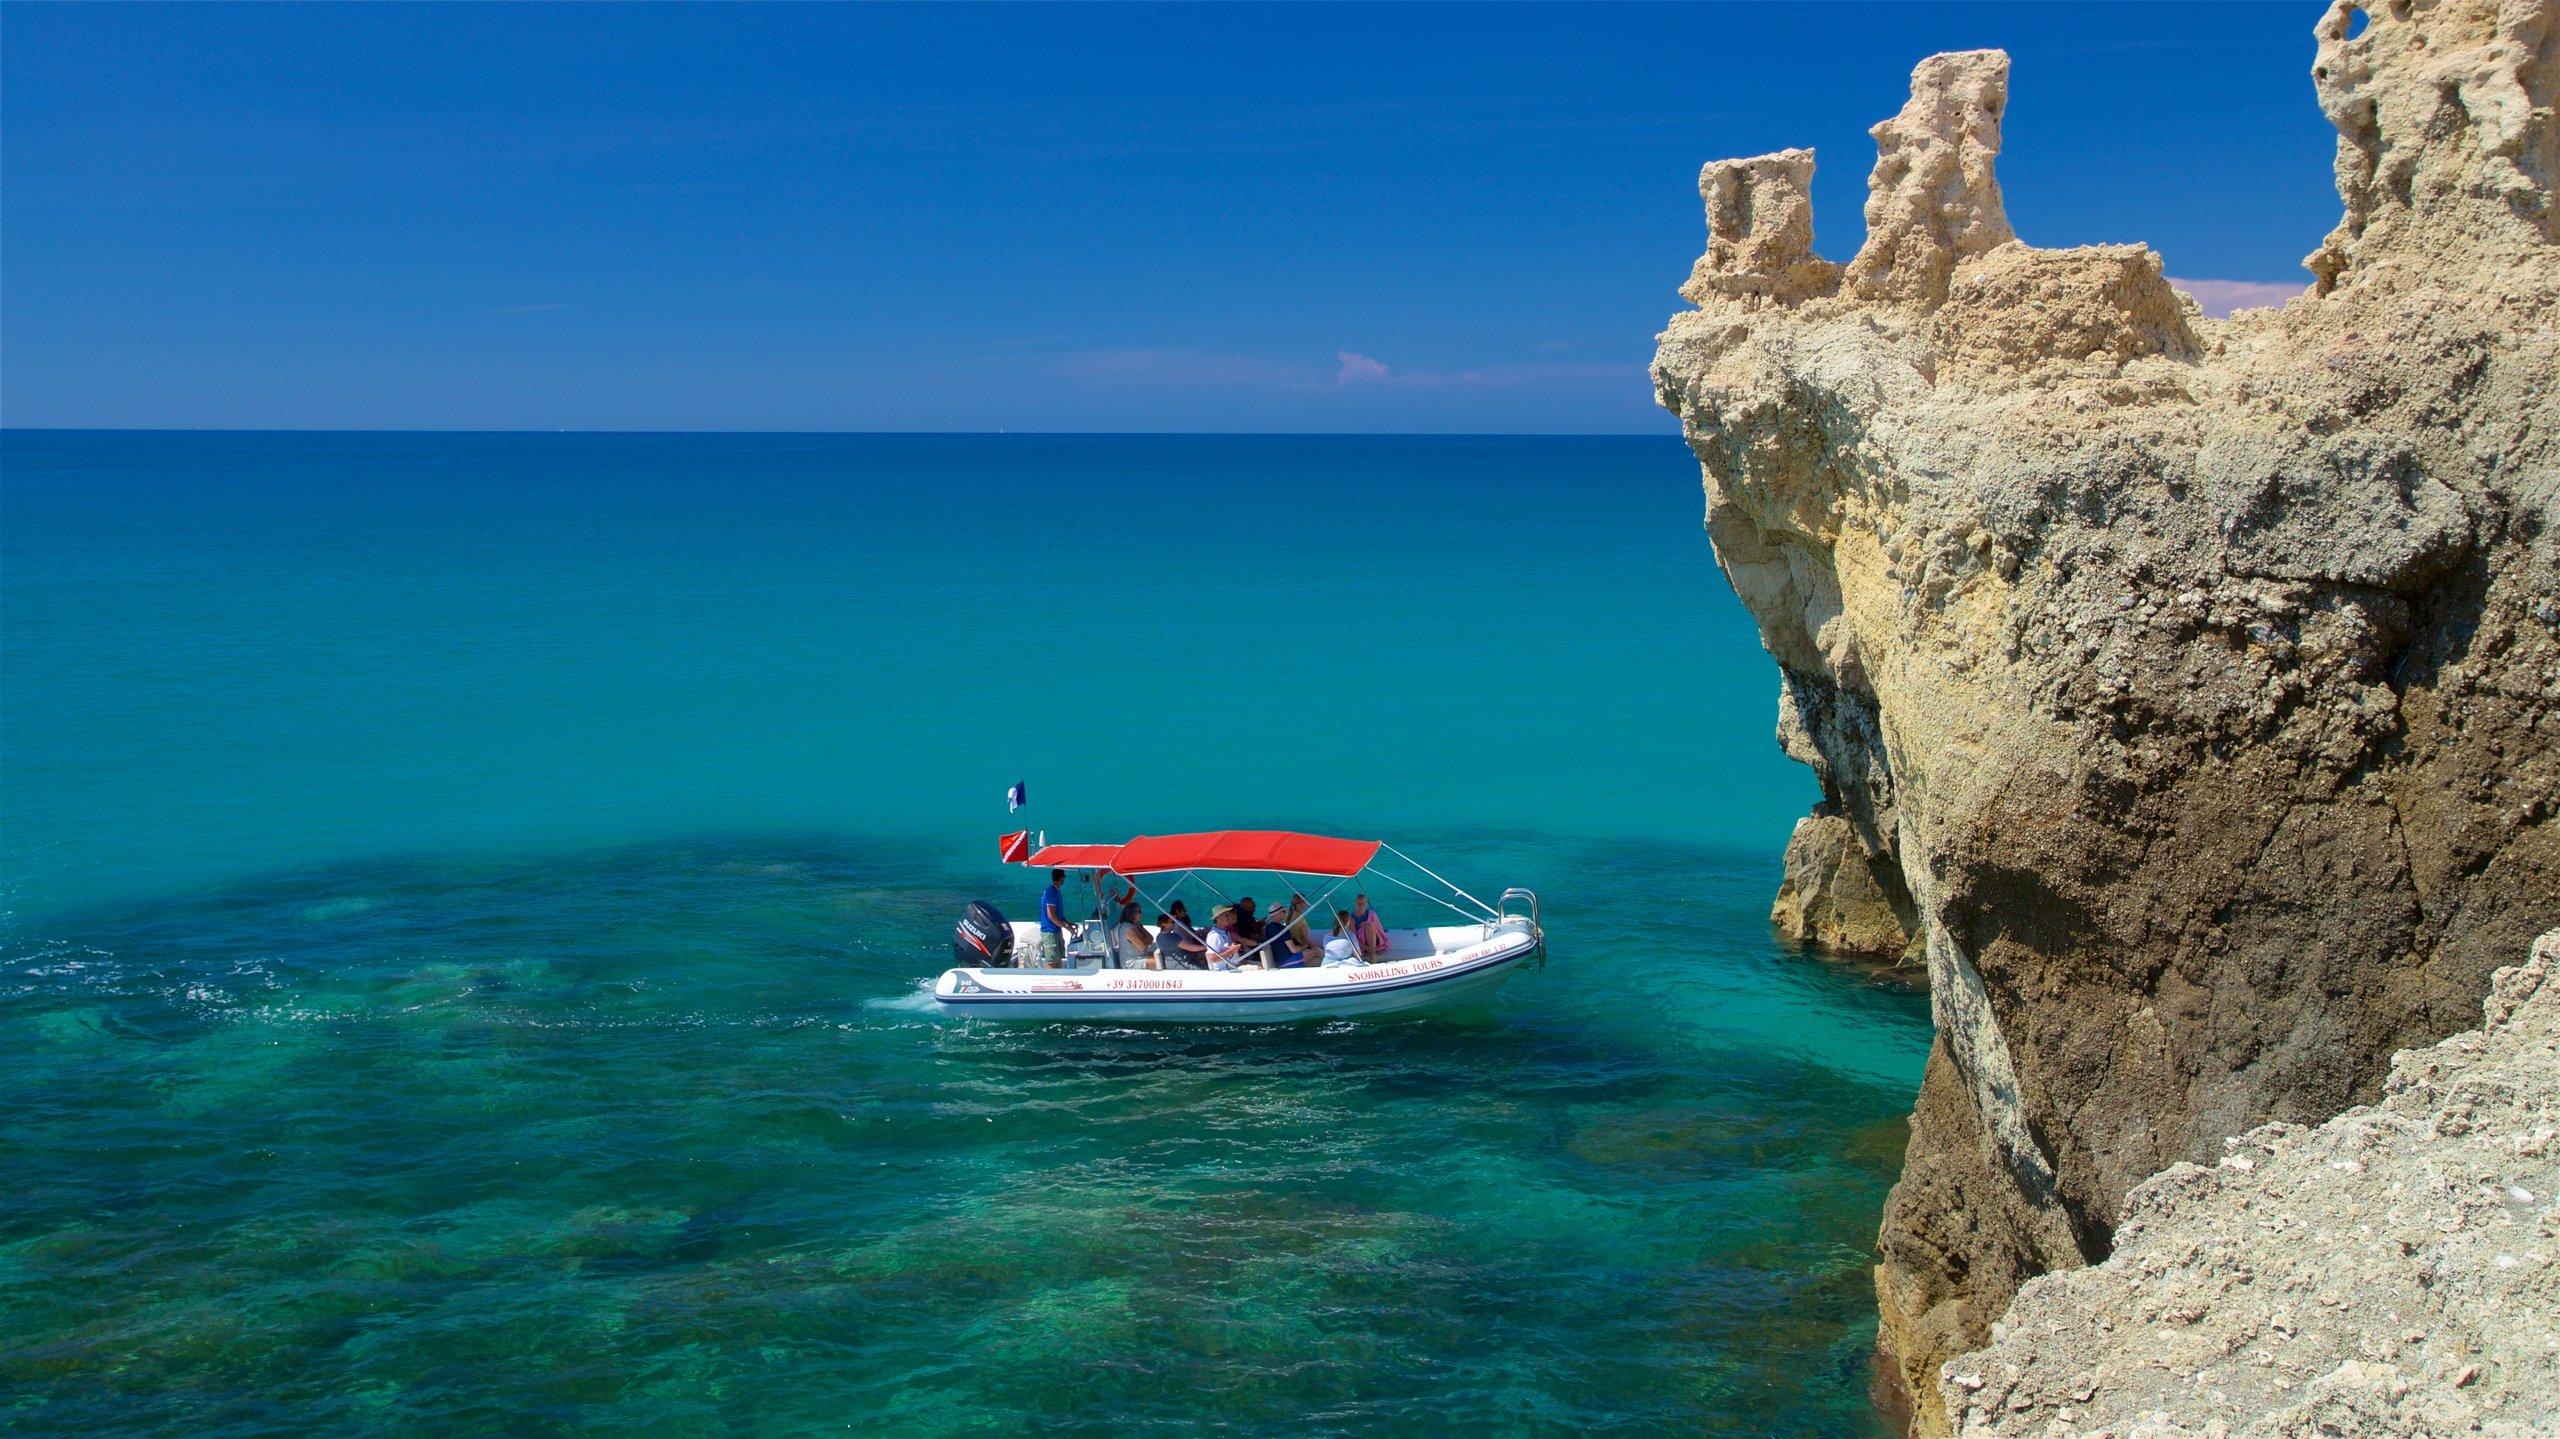 Riaci Beach, Ricadi, Calabria, Italy